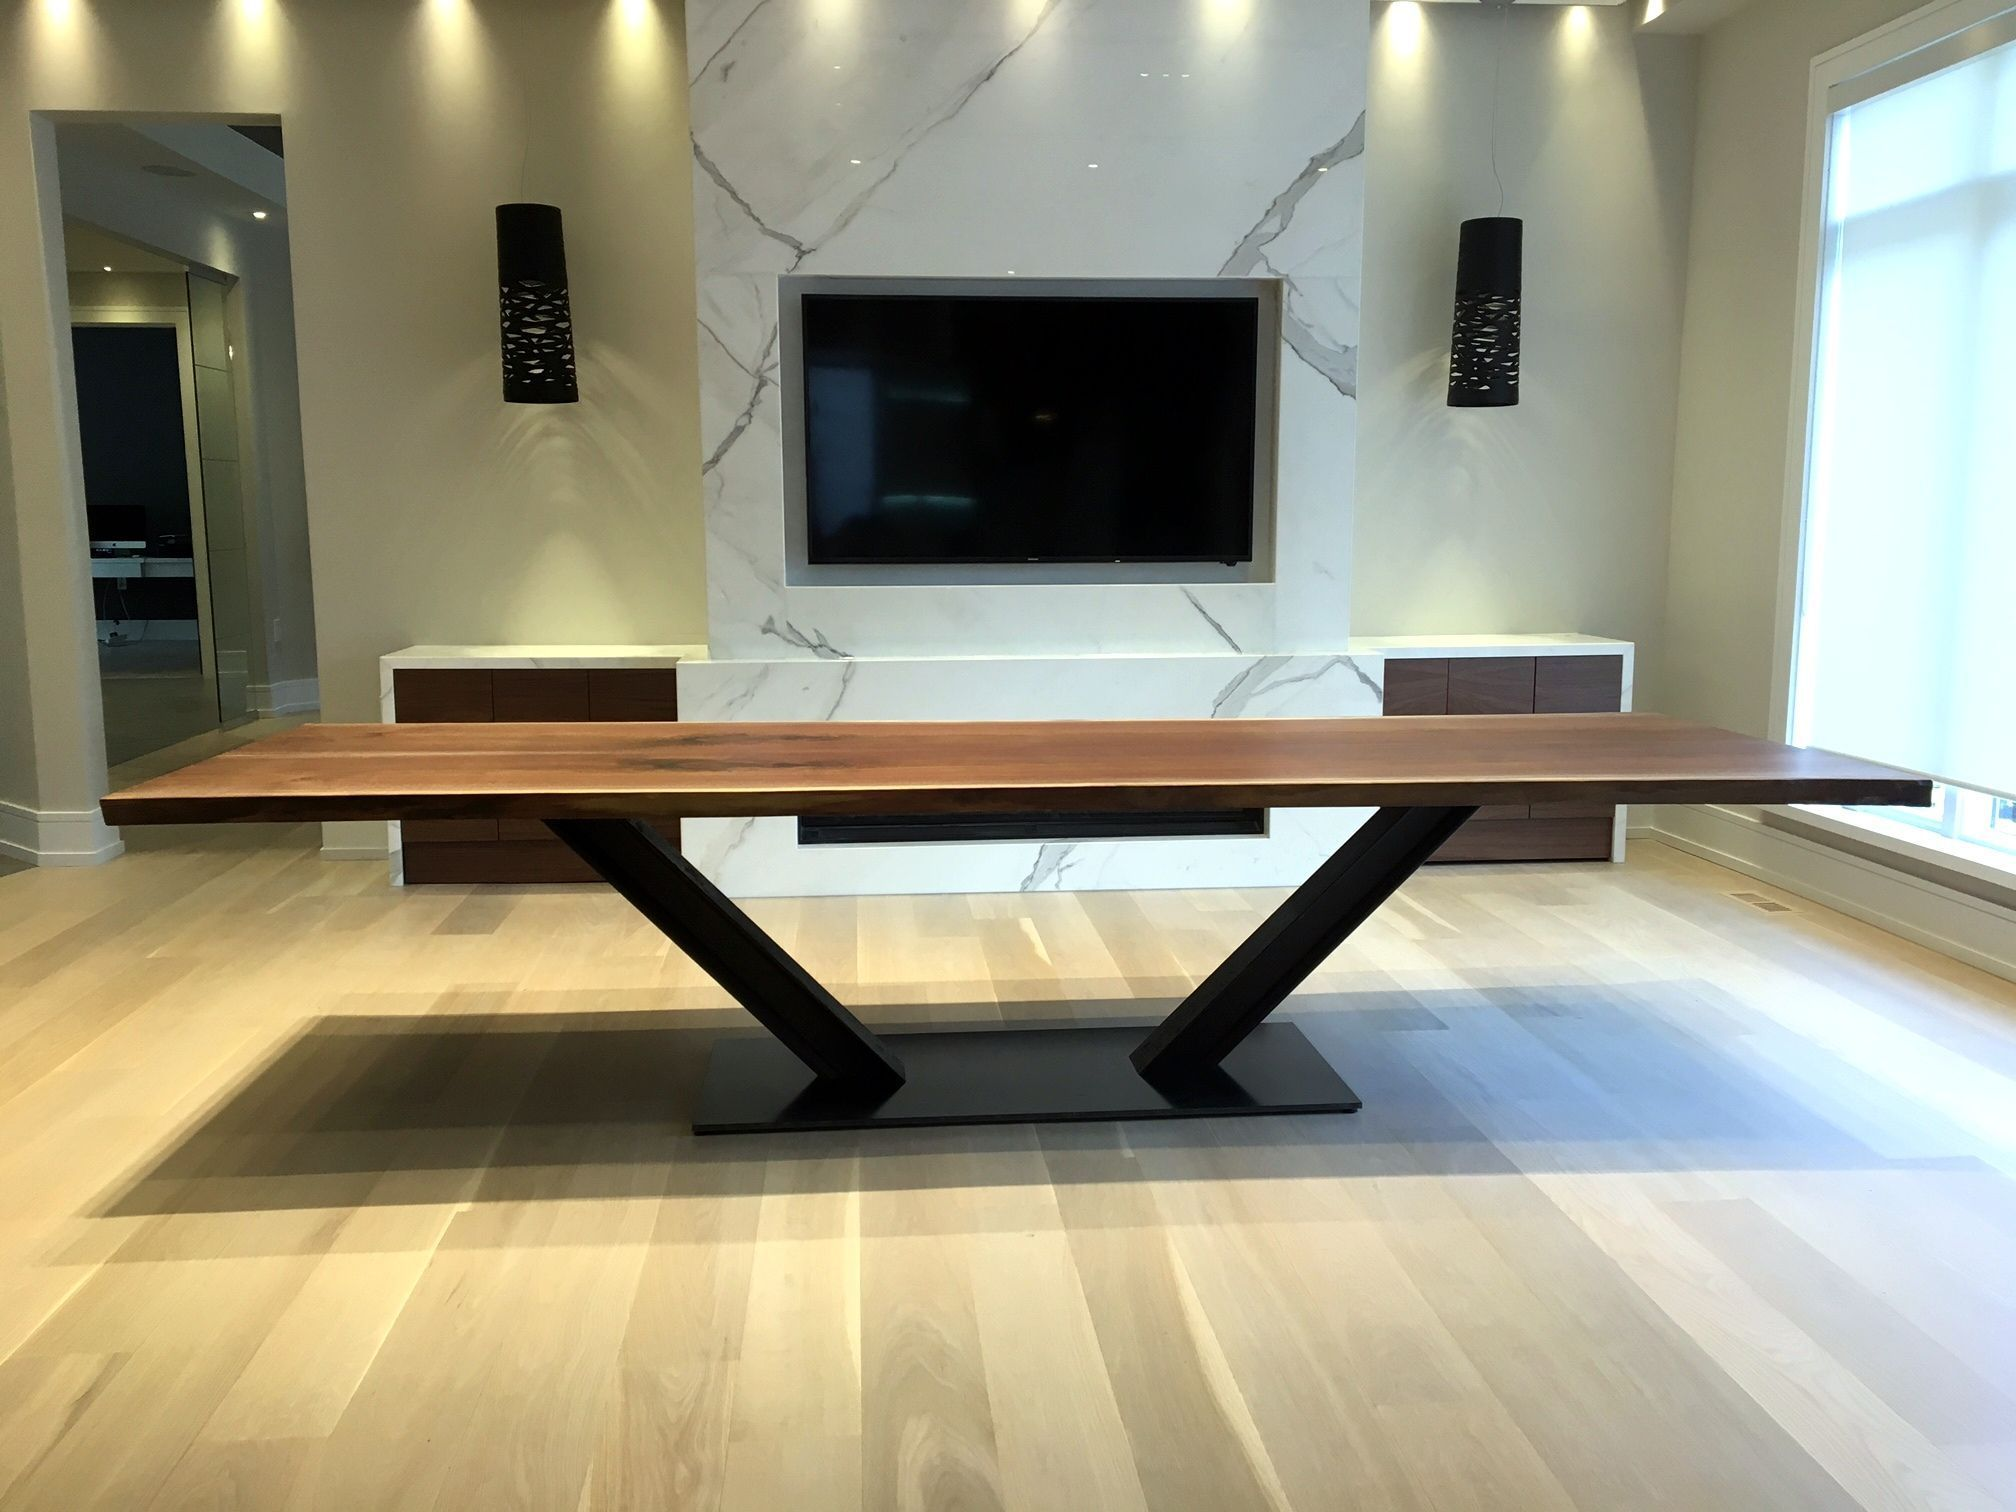 Live Edge Esstisch Aus Schwarzem Walnussholz Eisenbahnschiene Und Stahlsockel 120 Zo In 2020 Rustic Dining Room Table Modern Wood Dining Room Slab Dining Room Table